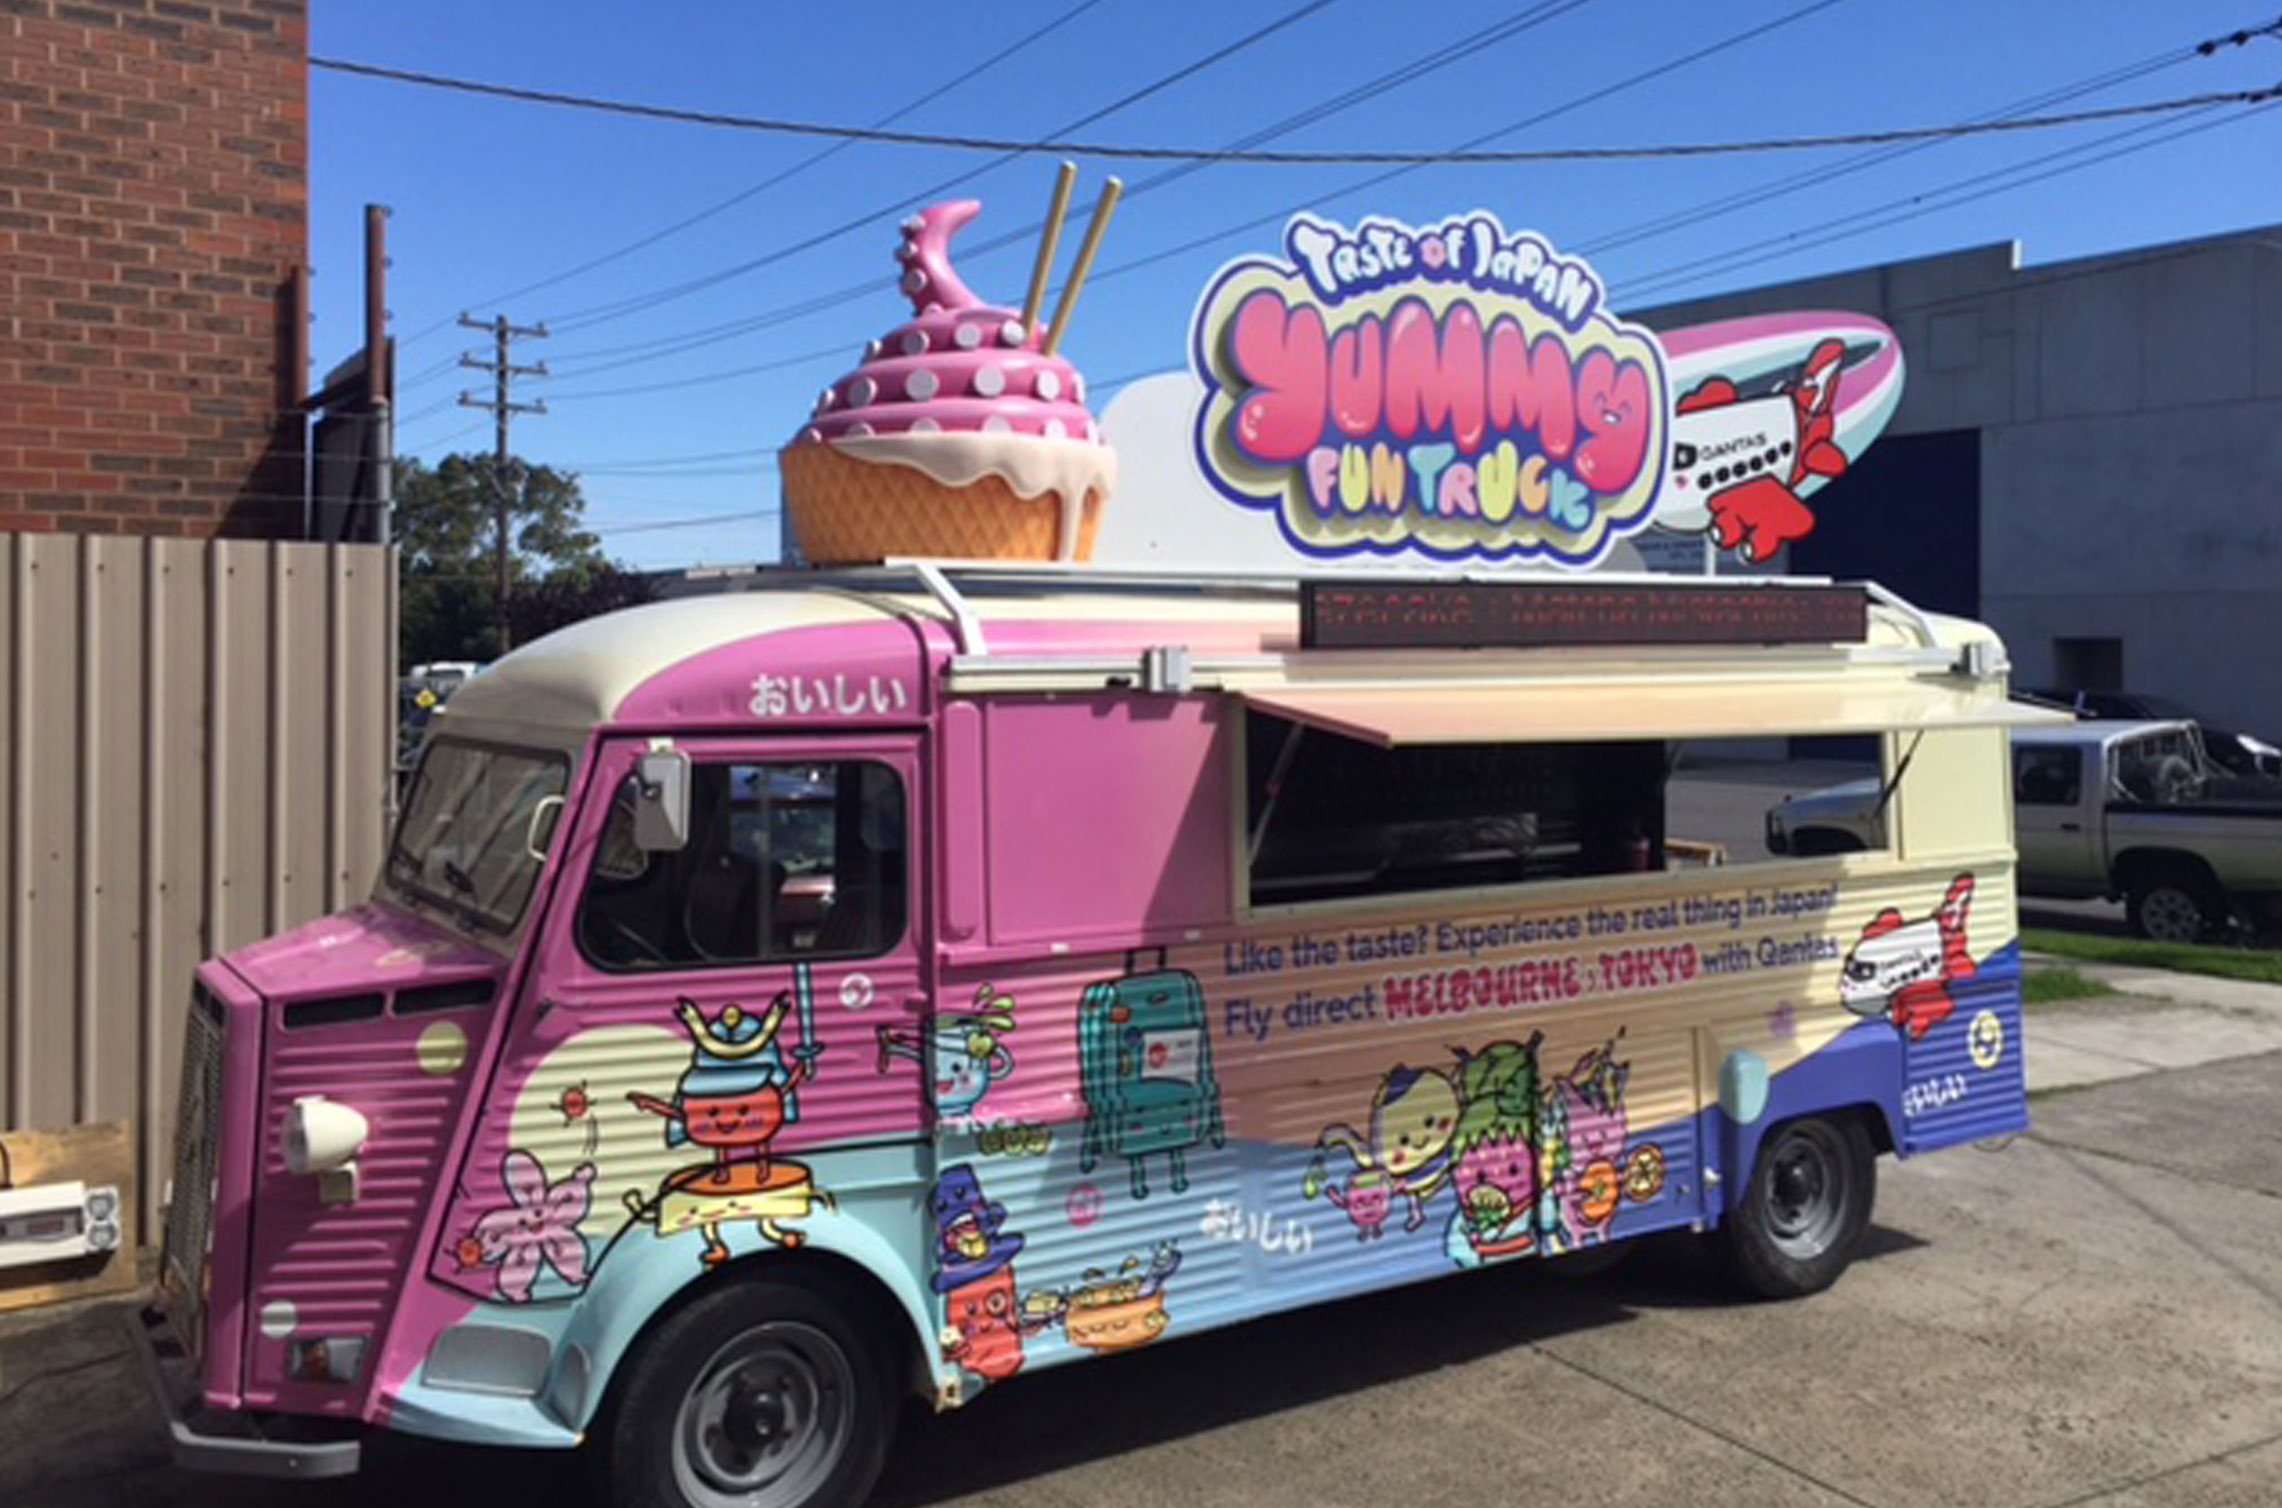 The Taste of Japan Yummy Fun Truck